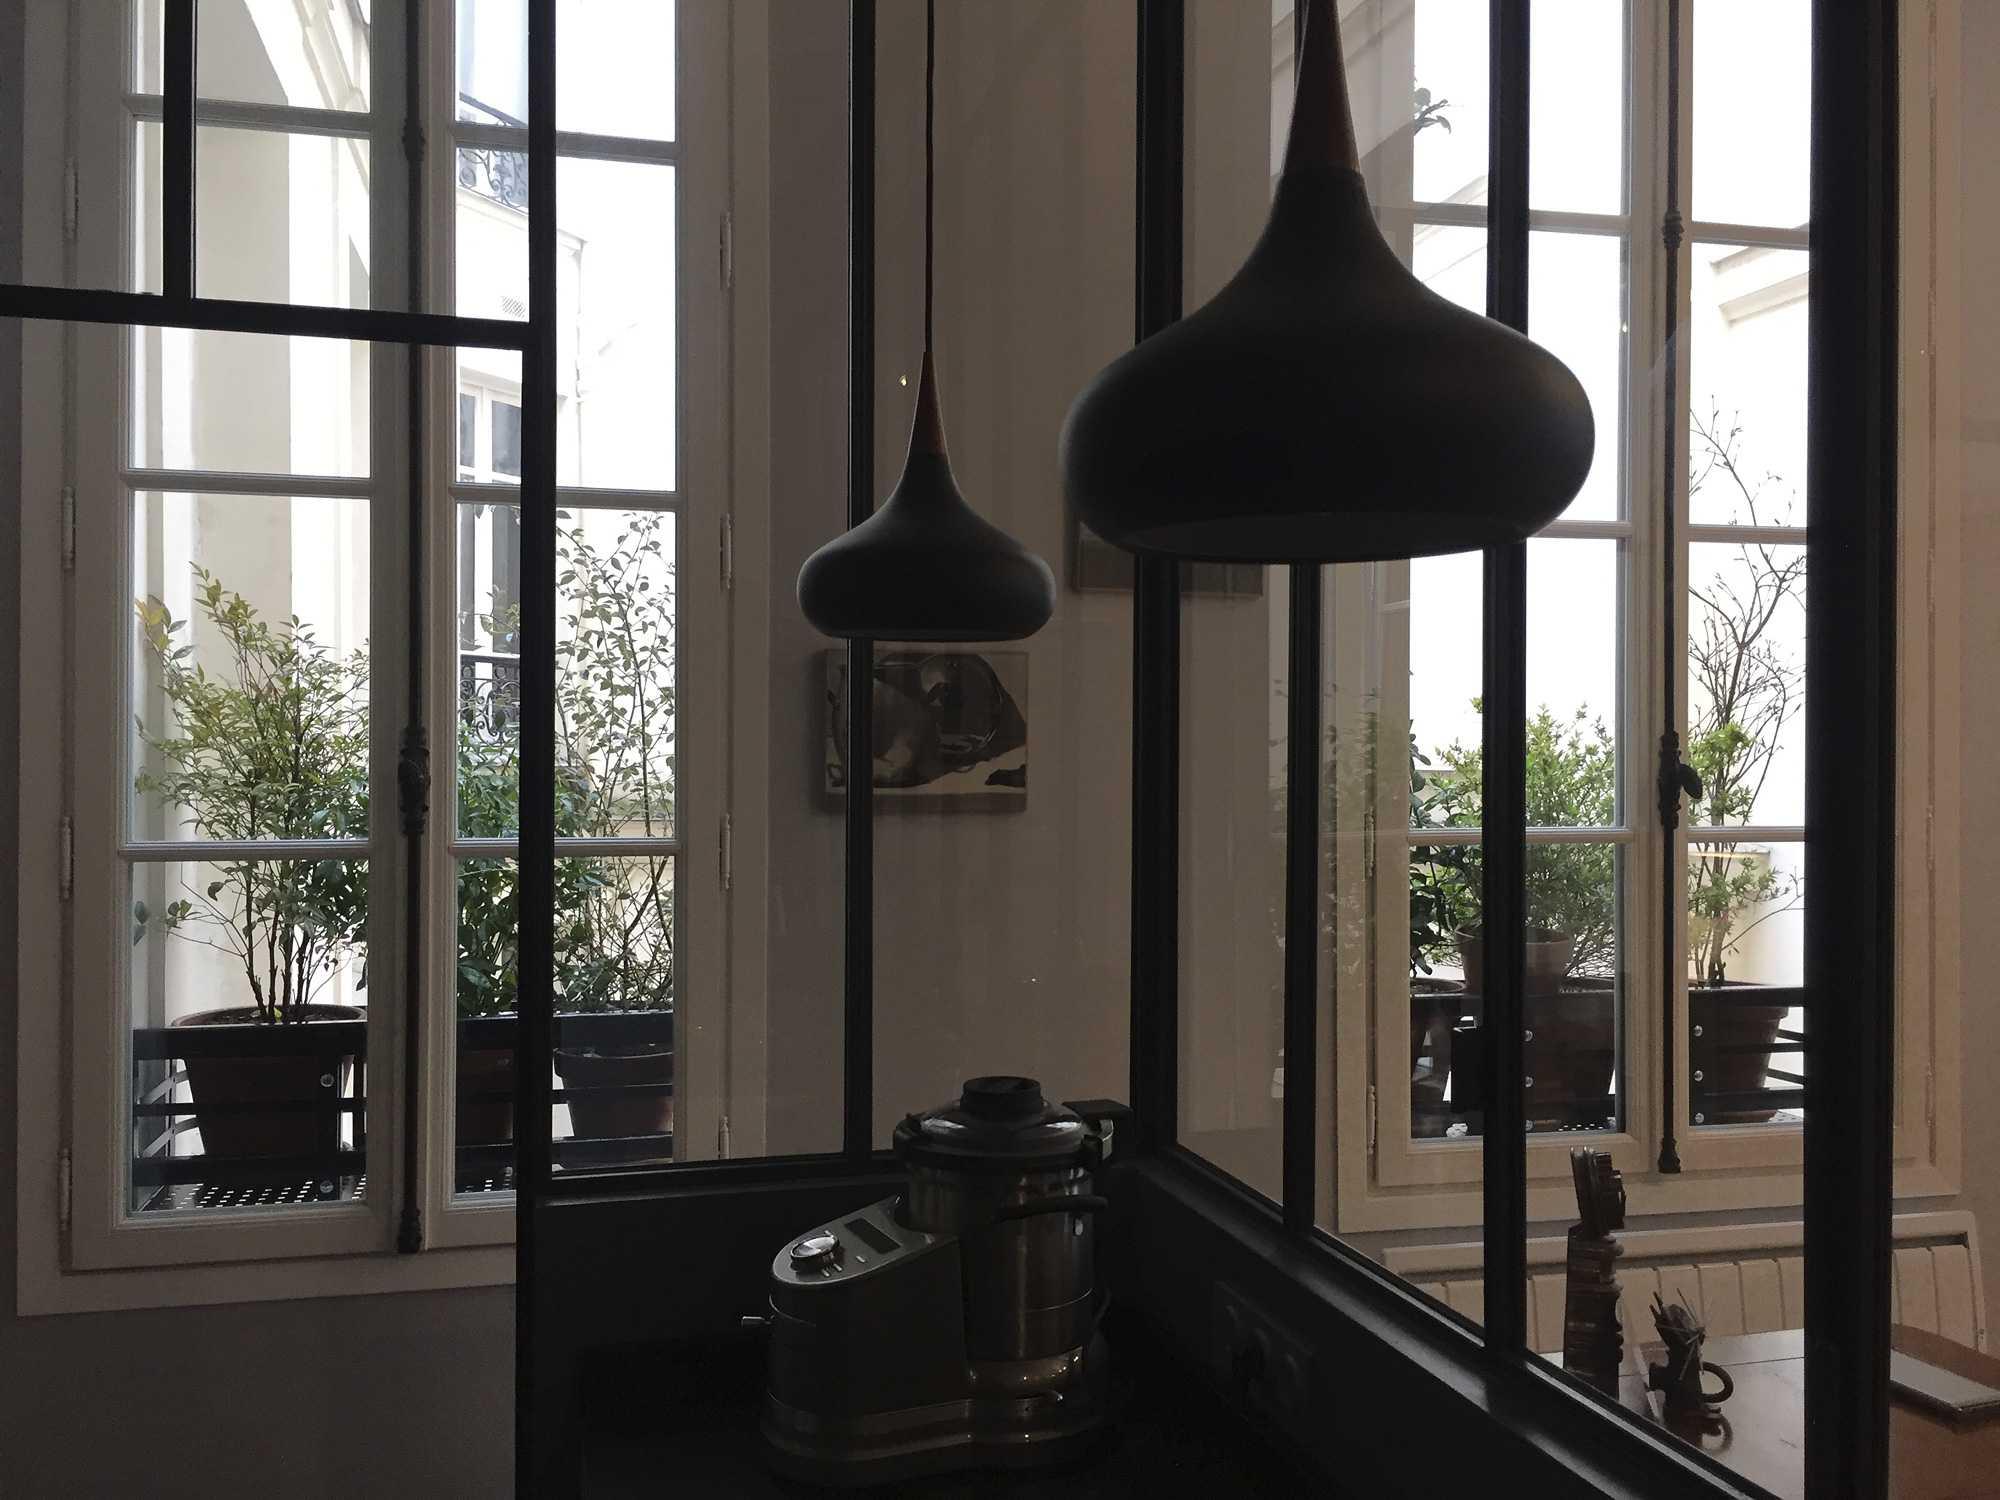 reaumur 003 le vert soi. Black Bedroom Furniture Sets. Home Design Ideas